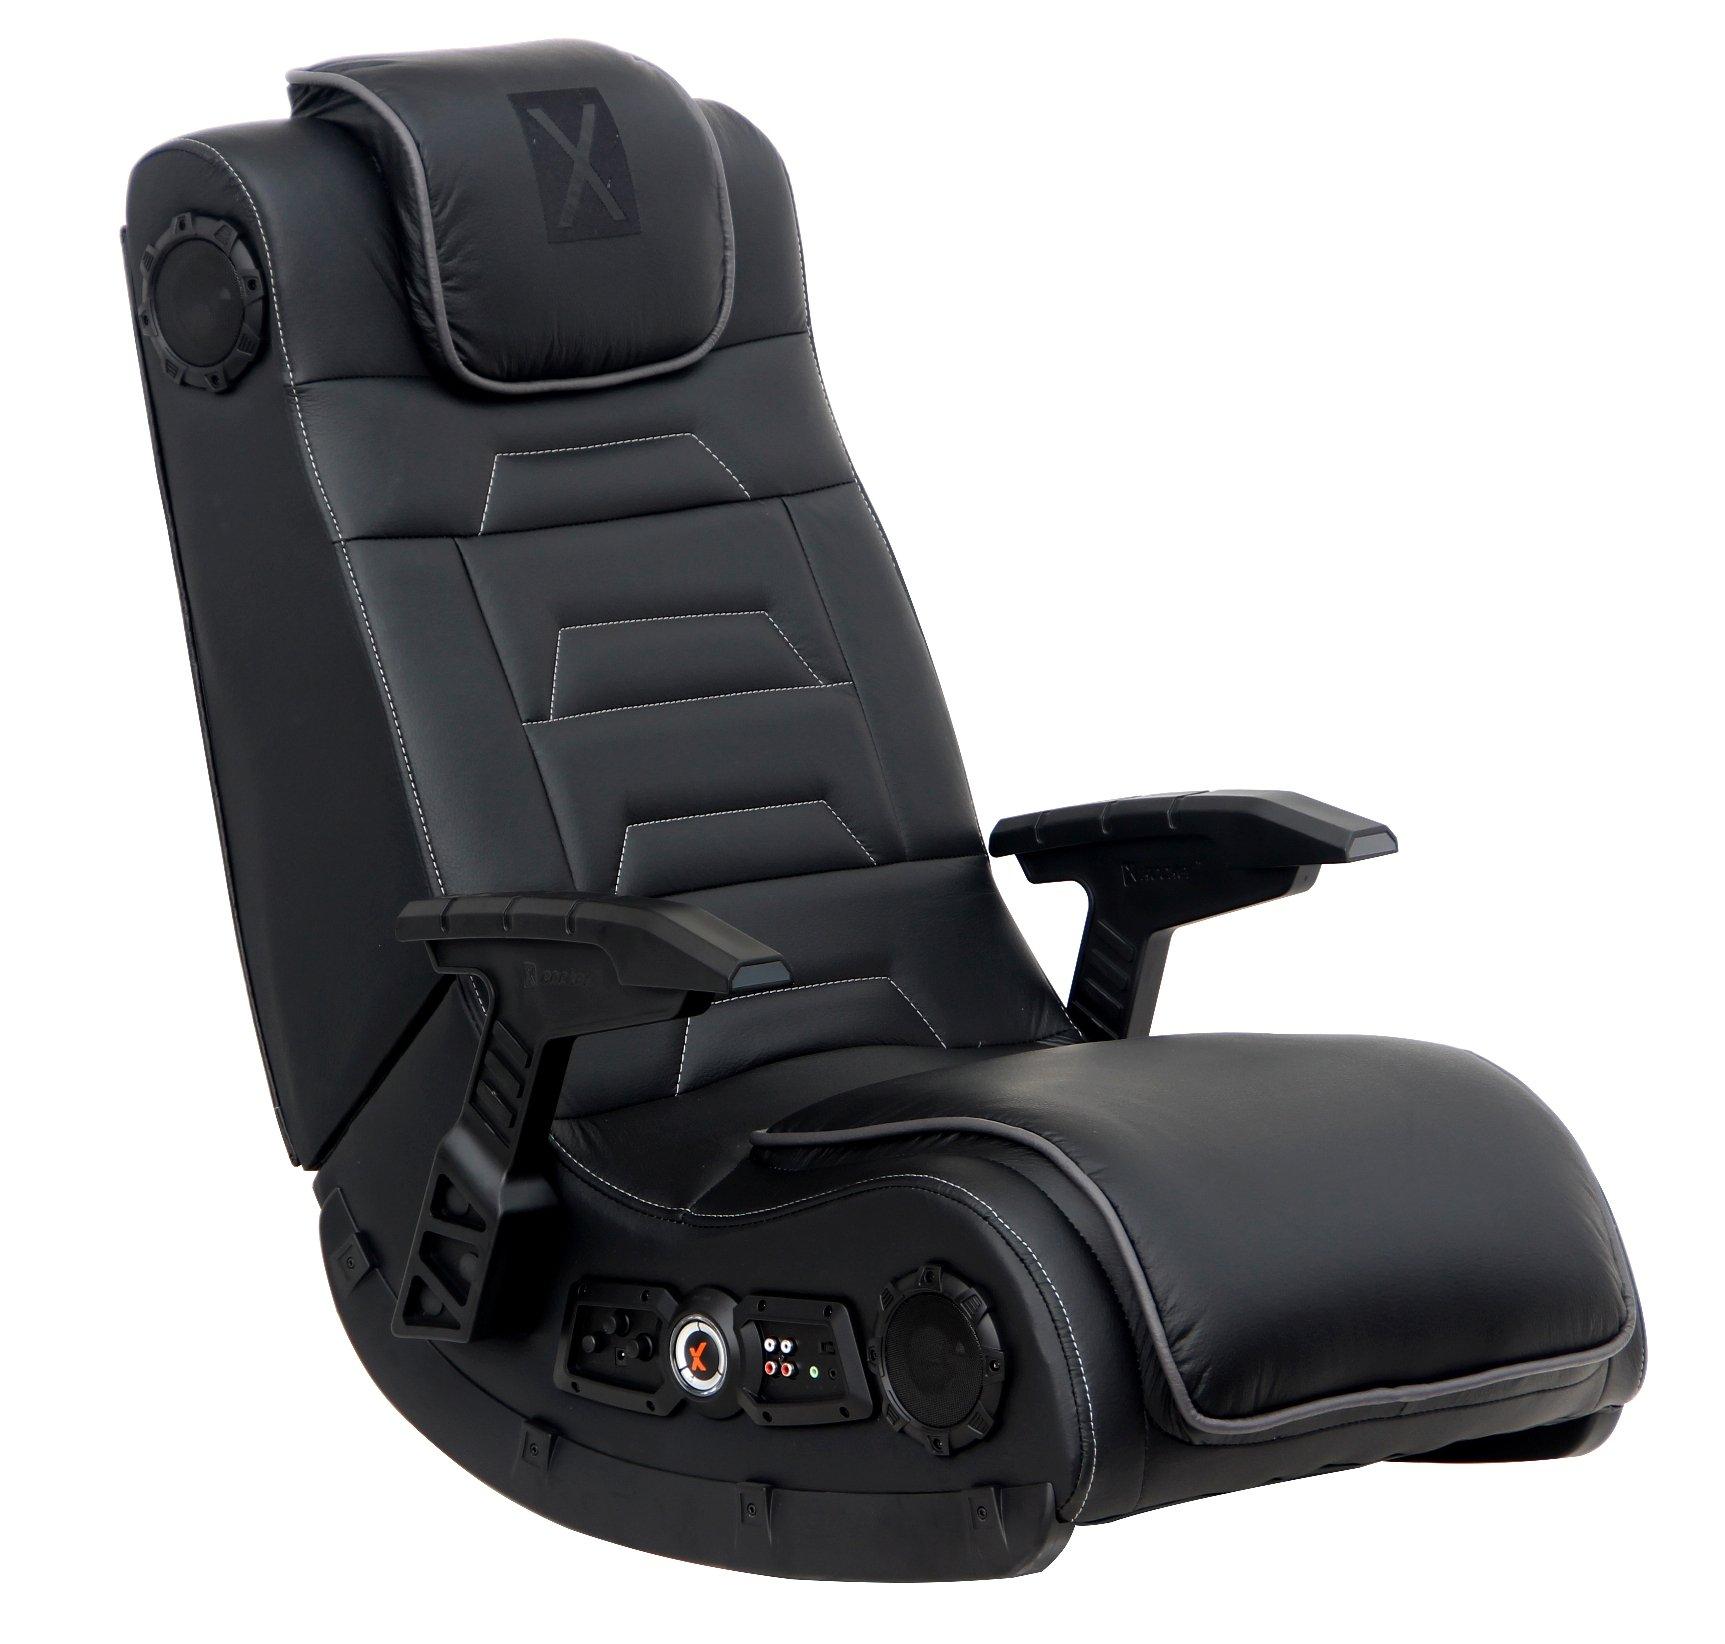 X Rocker 51259 Pro H3 4.1 Audio Gaming Chair, Wireless by X Rocker